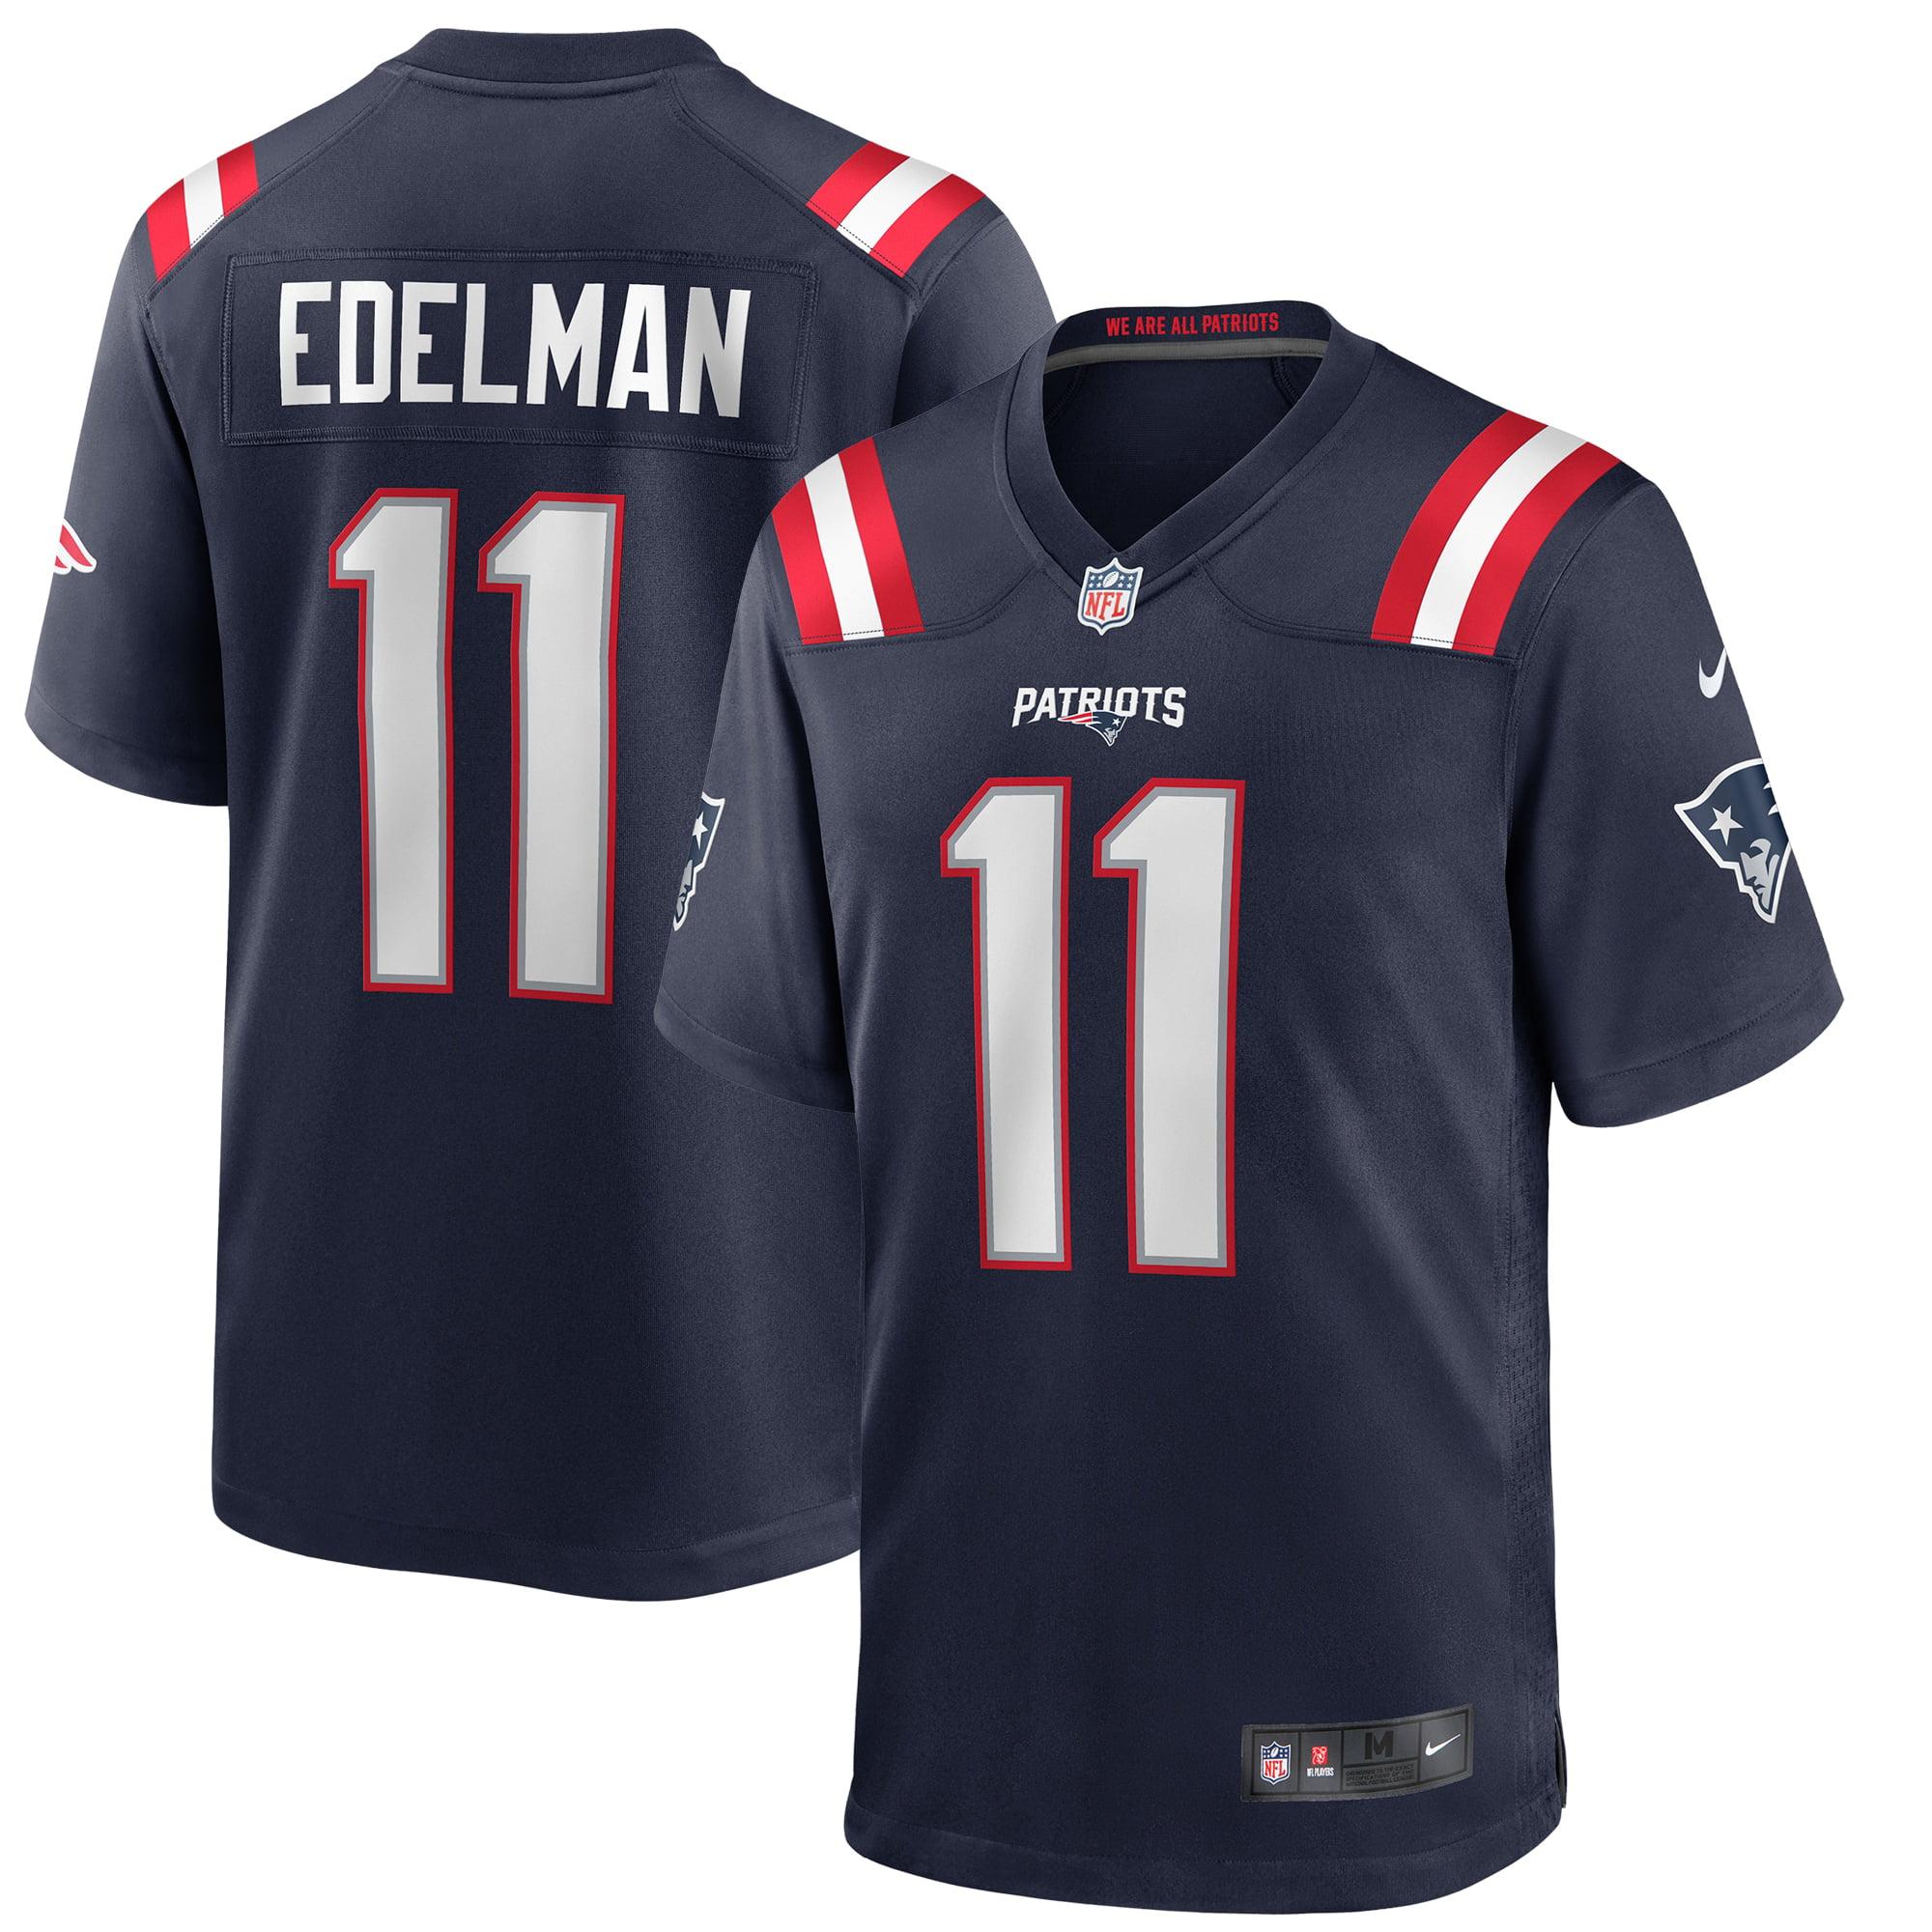 Julian Edelman New England Patriots Nike Game Jersey - Navy - Walmart.com